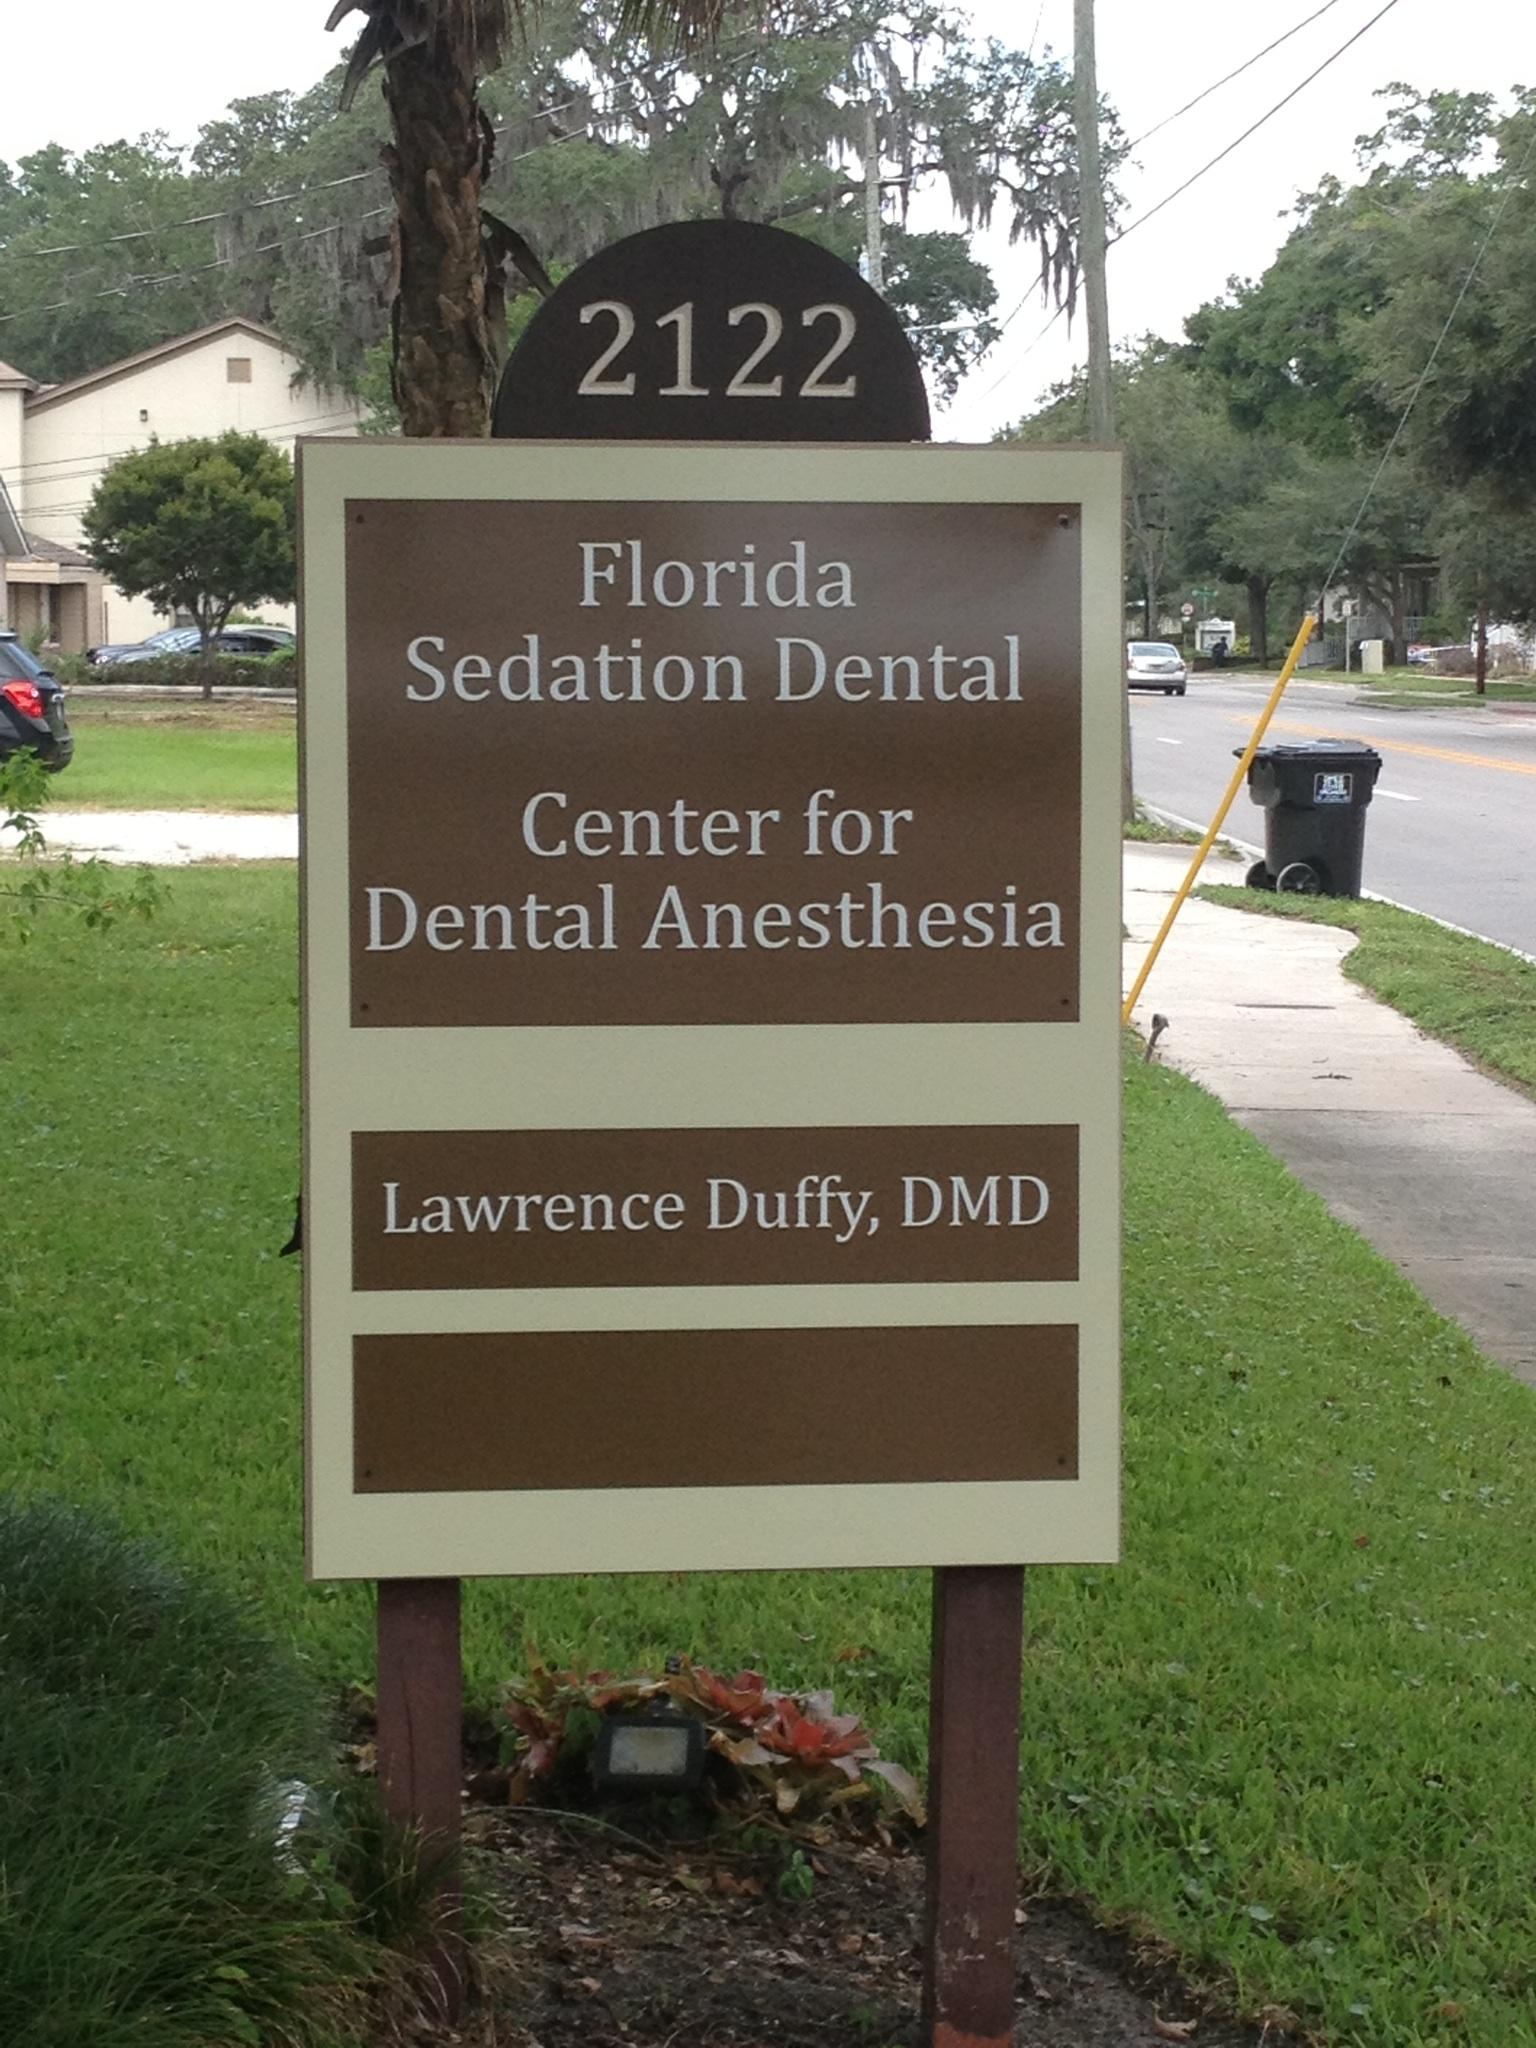 Center for Dental Anesthesia image 2